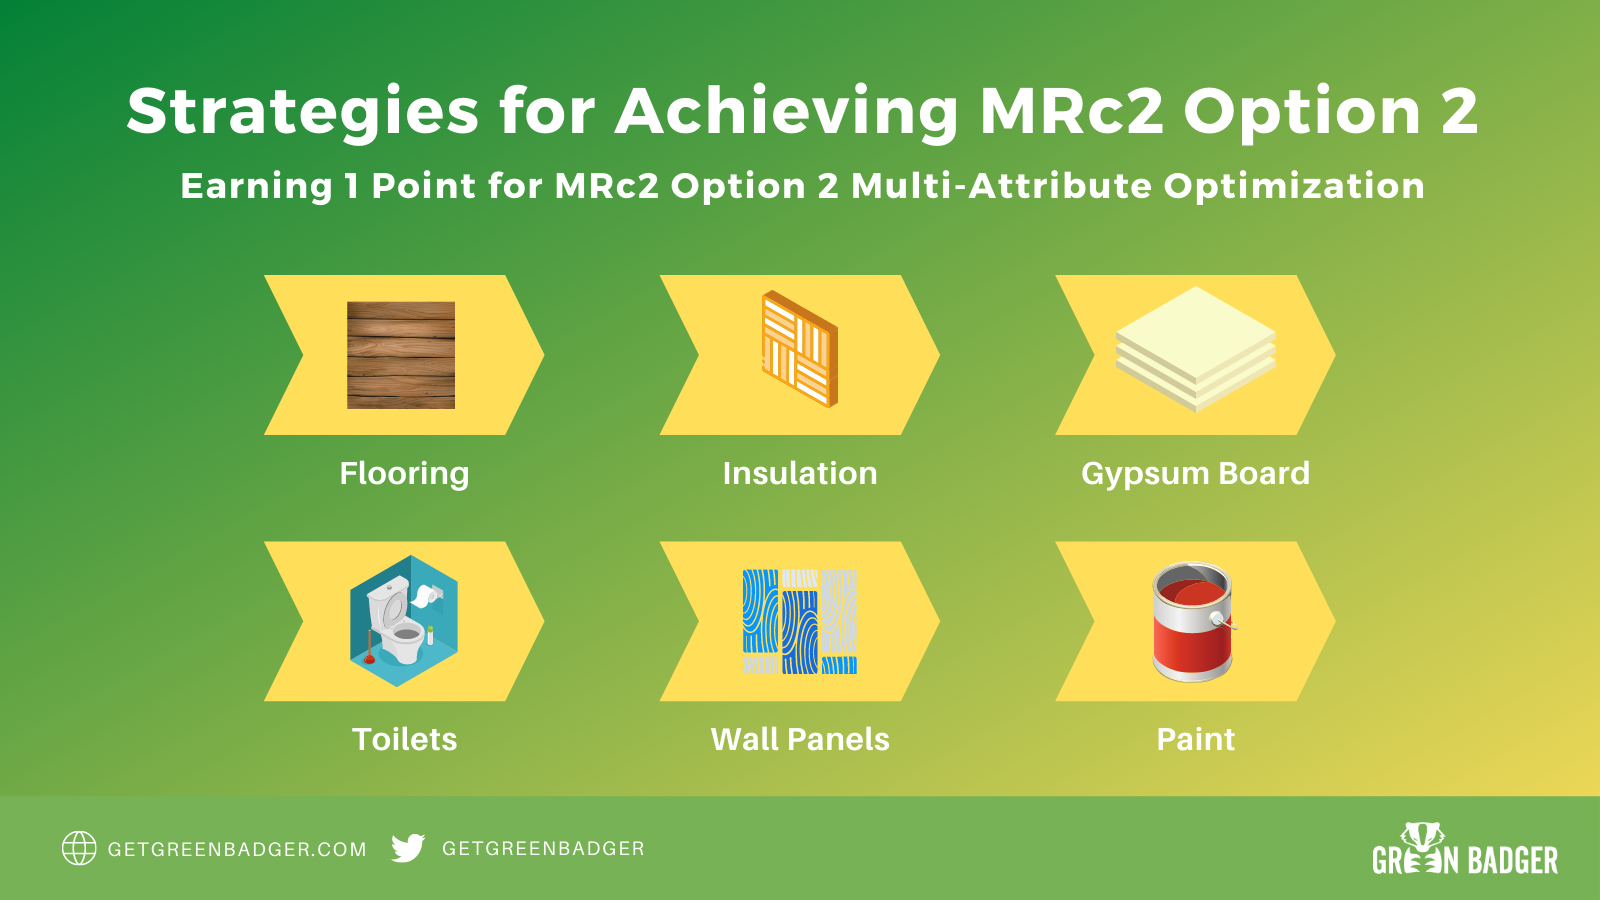 MRc2 Multi Attribute Optimization Green Badger Ultimate Guide to LEED v4